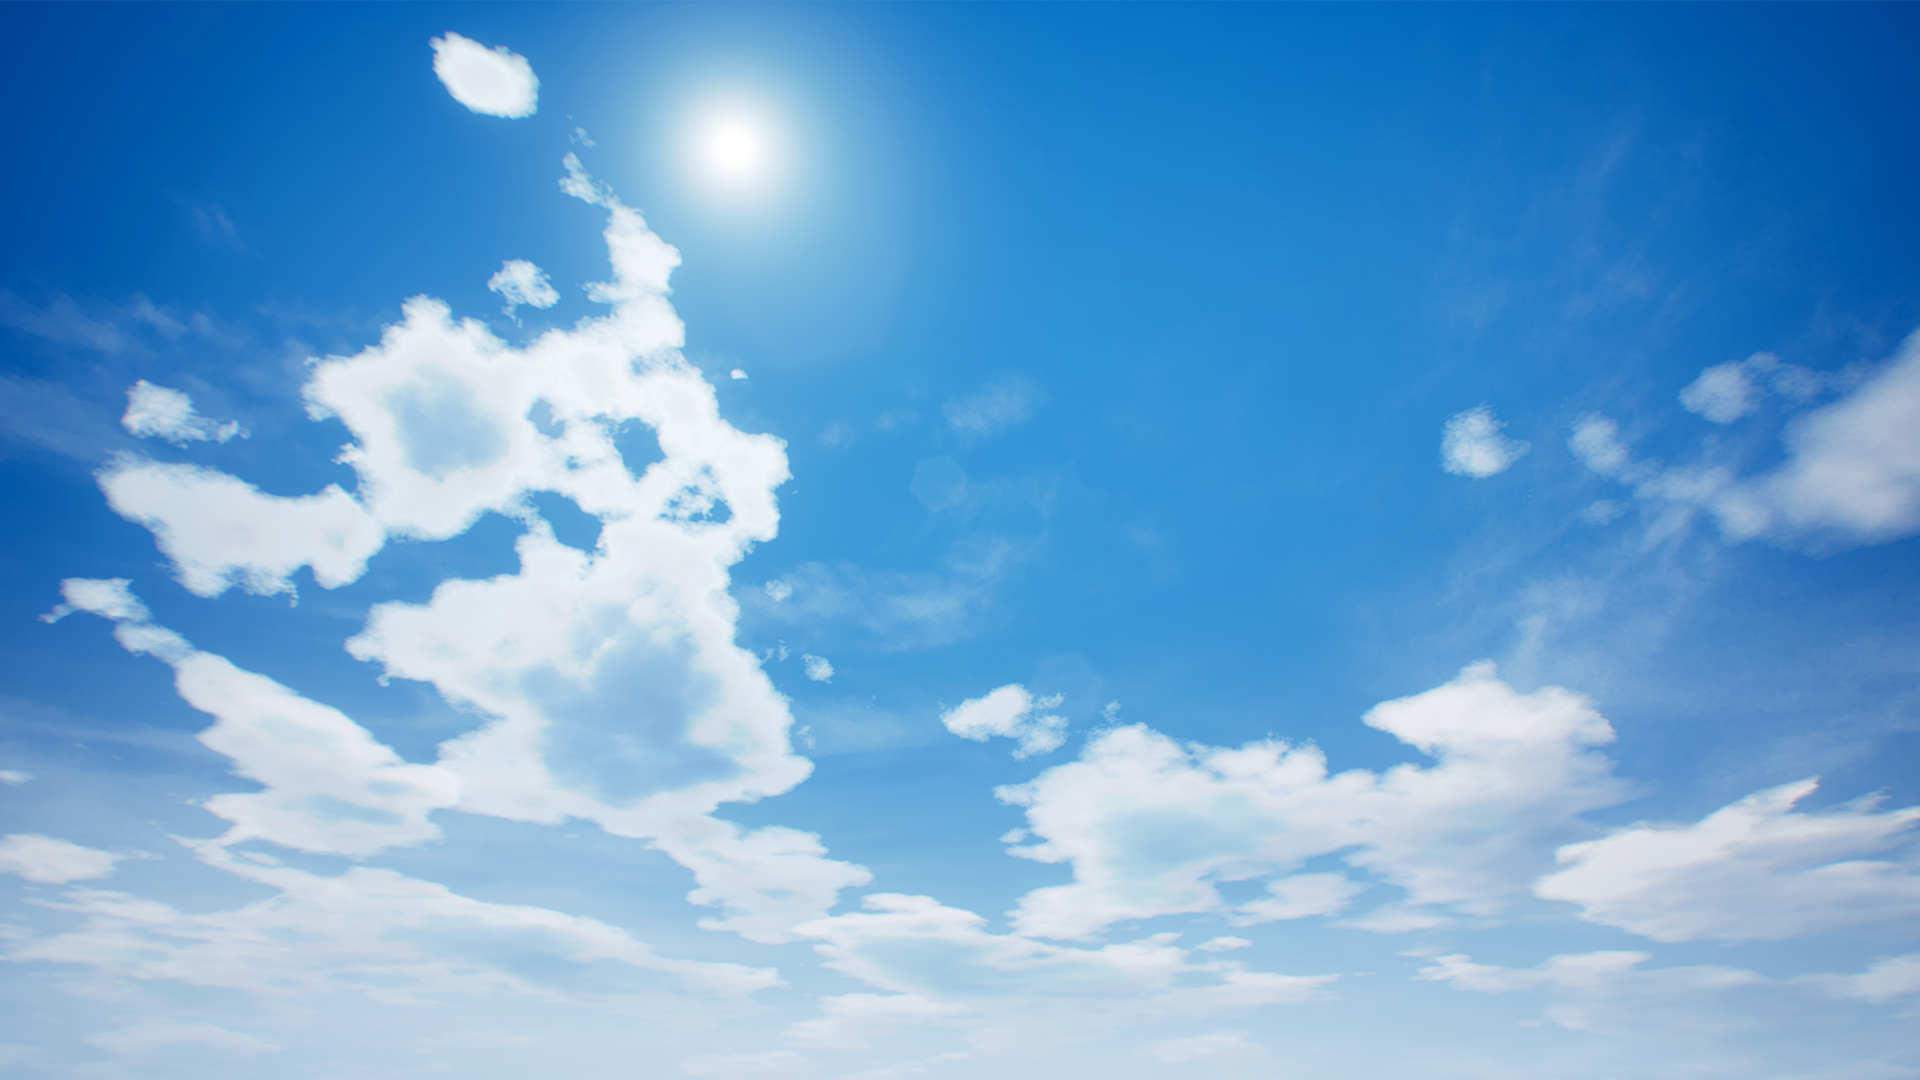 Ultra Dynamic Sky by Everett Gunther in Blueprints - UE4